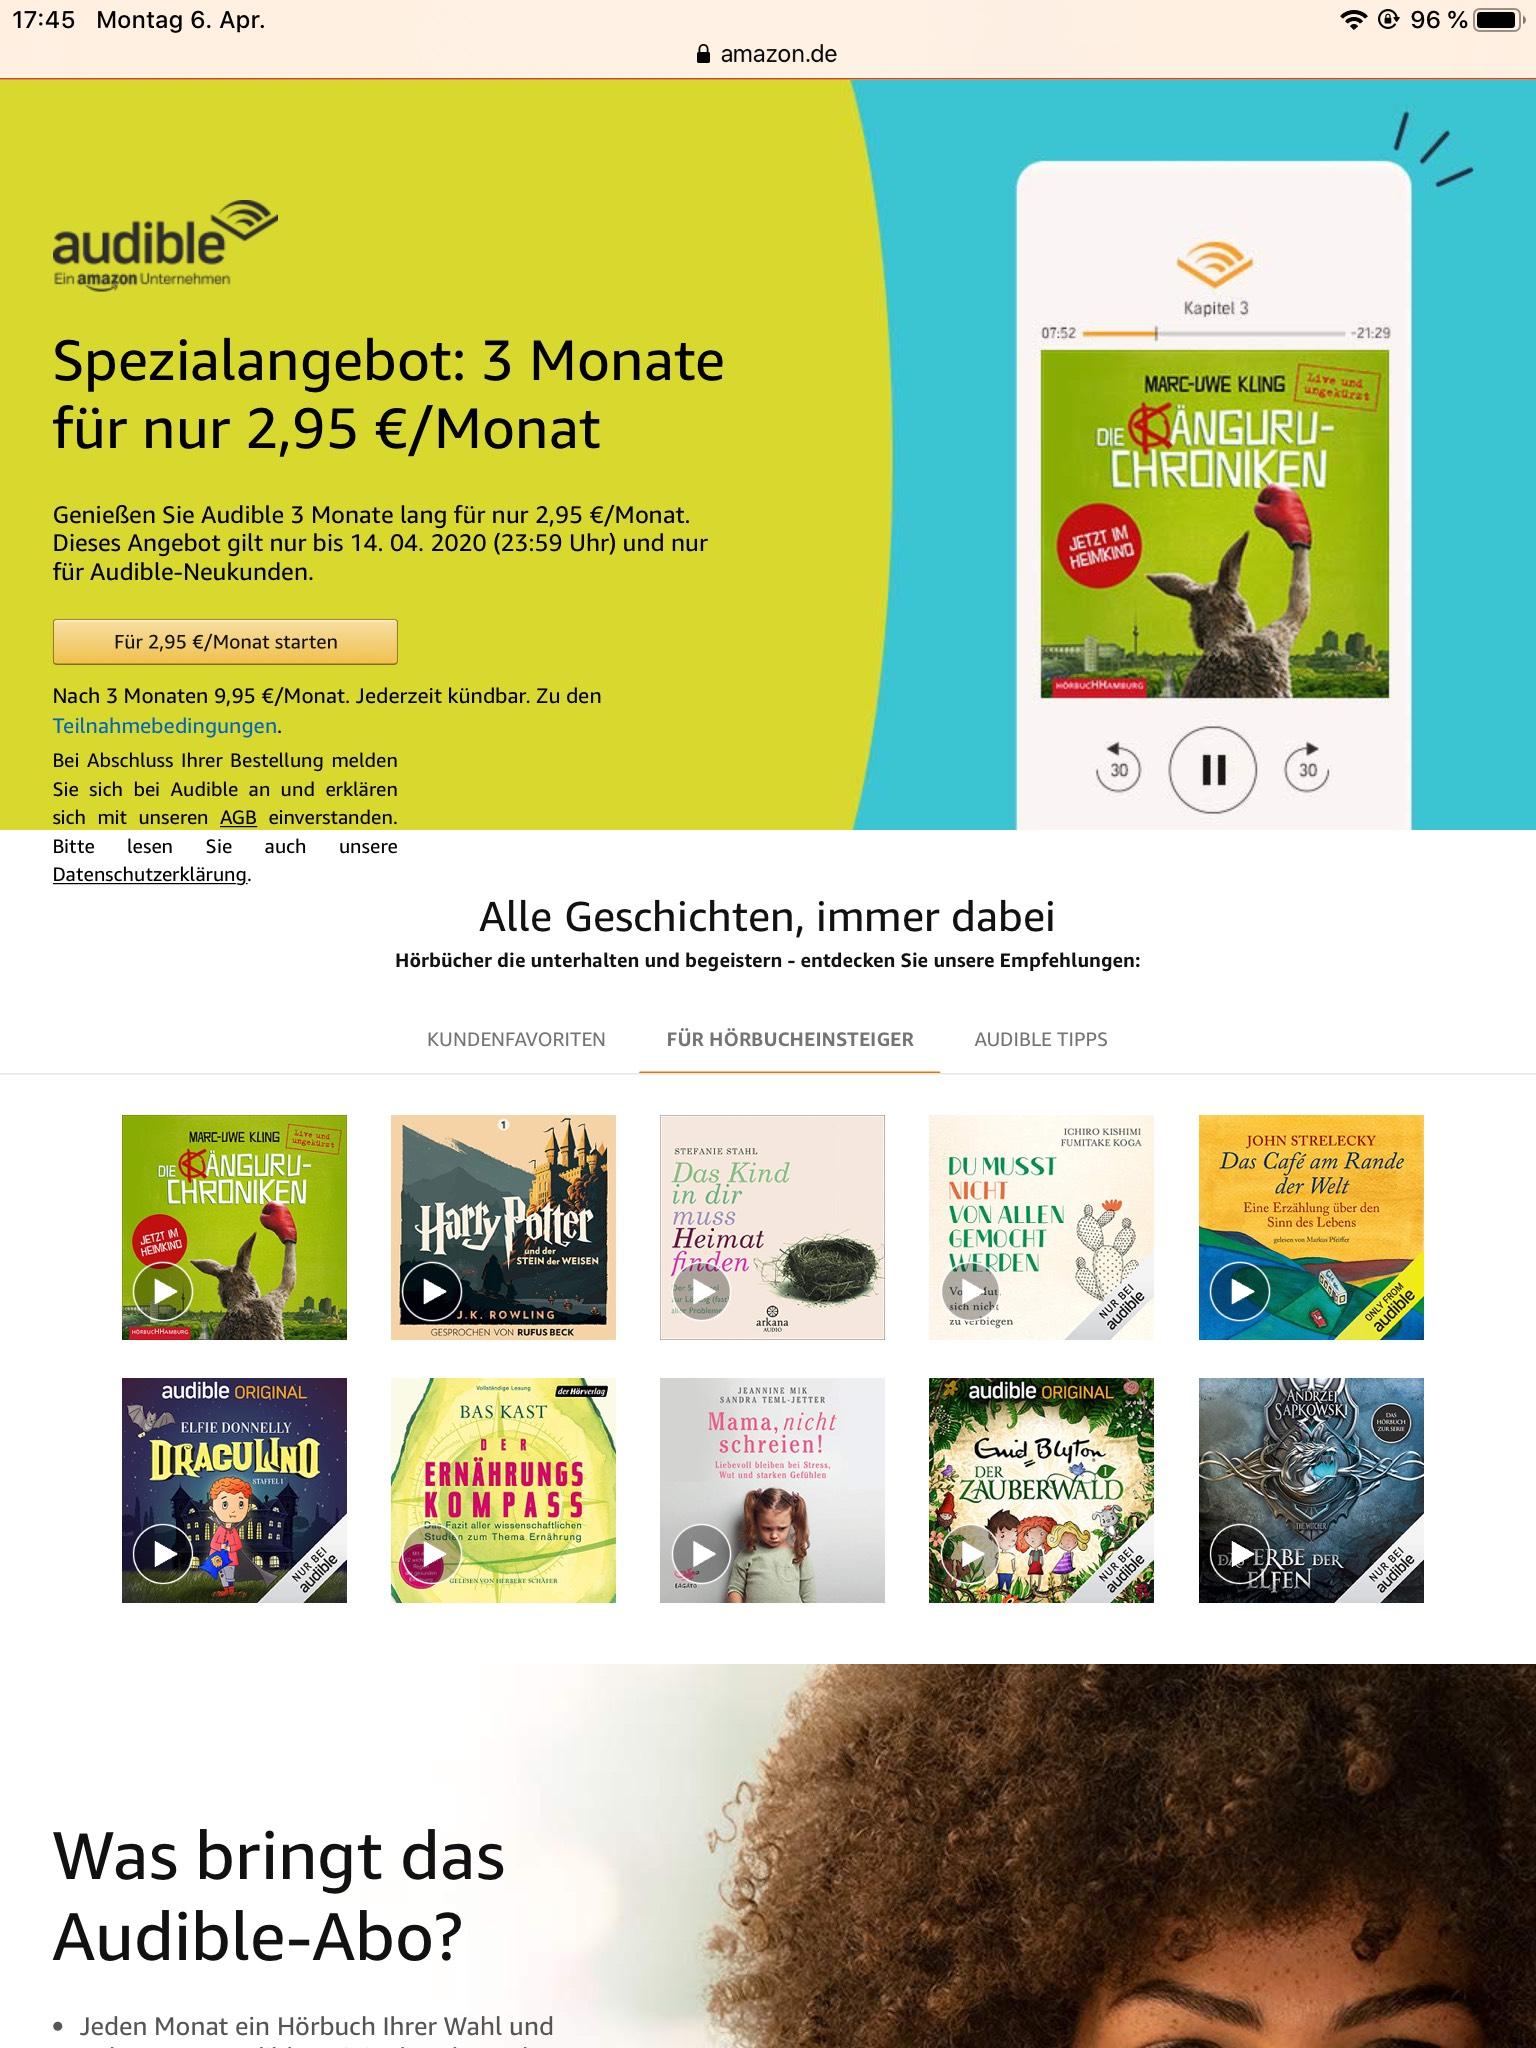 Audible Hörbücher für 2,95 Euro 3 Monate lang